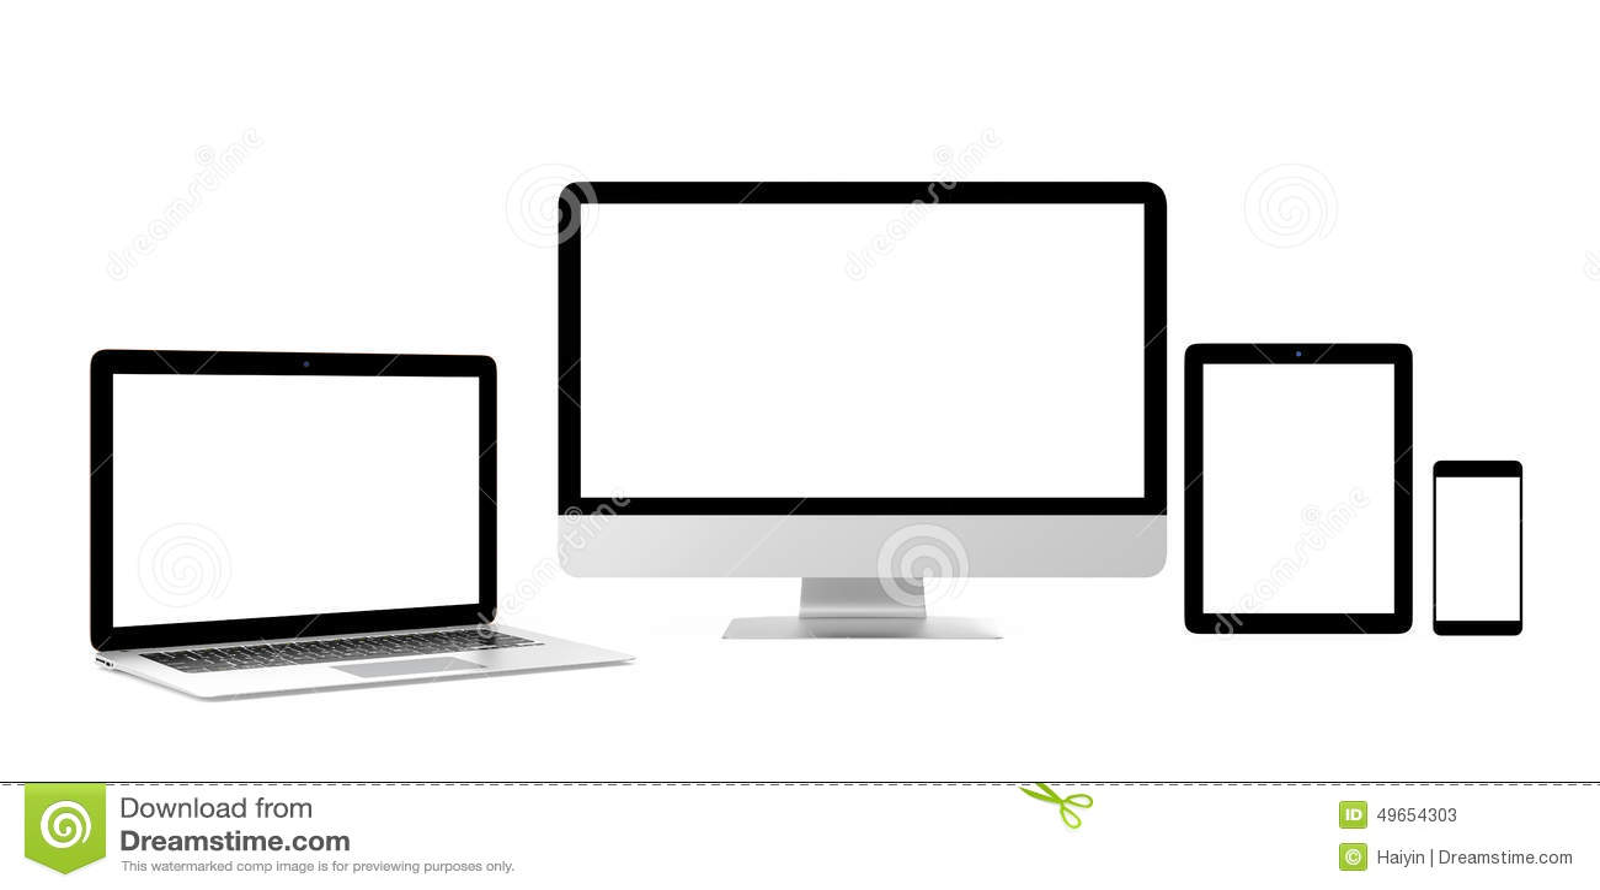 Smart Phone, Laptop, Desktop Computer With Blank Screen